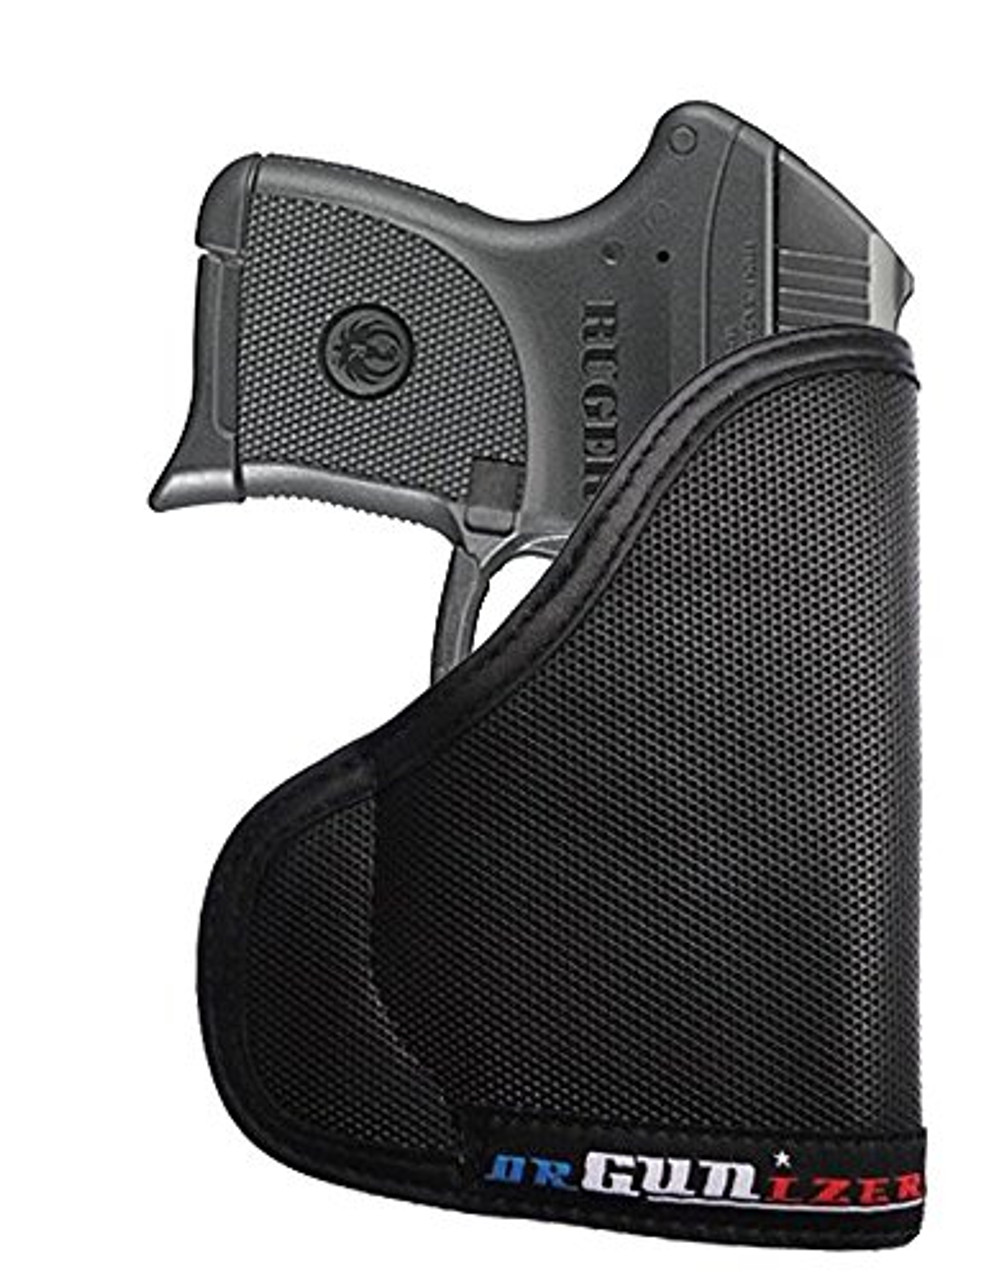 Ruger LC9 with Armalaser Custom Fit Leather Trimmed orGUNizer Poly Pocket Holster For Concealed Carry Comfort (D)